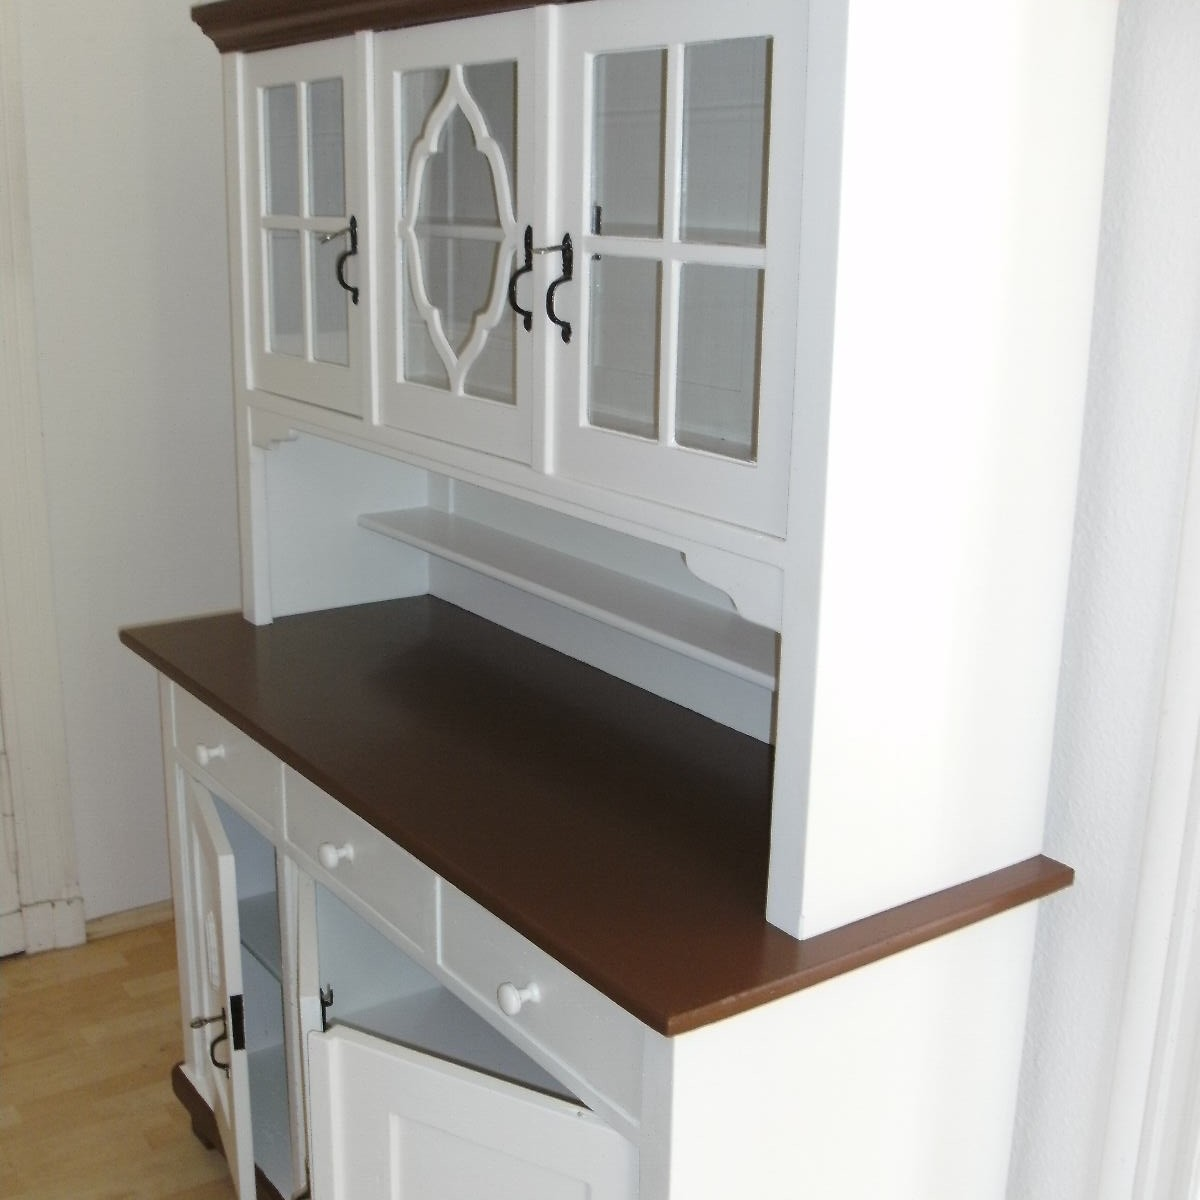 Bau u.Möbelhandwerk, Möbel aufgearbeitet